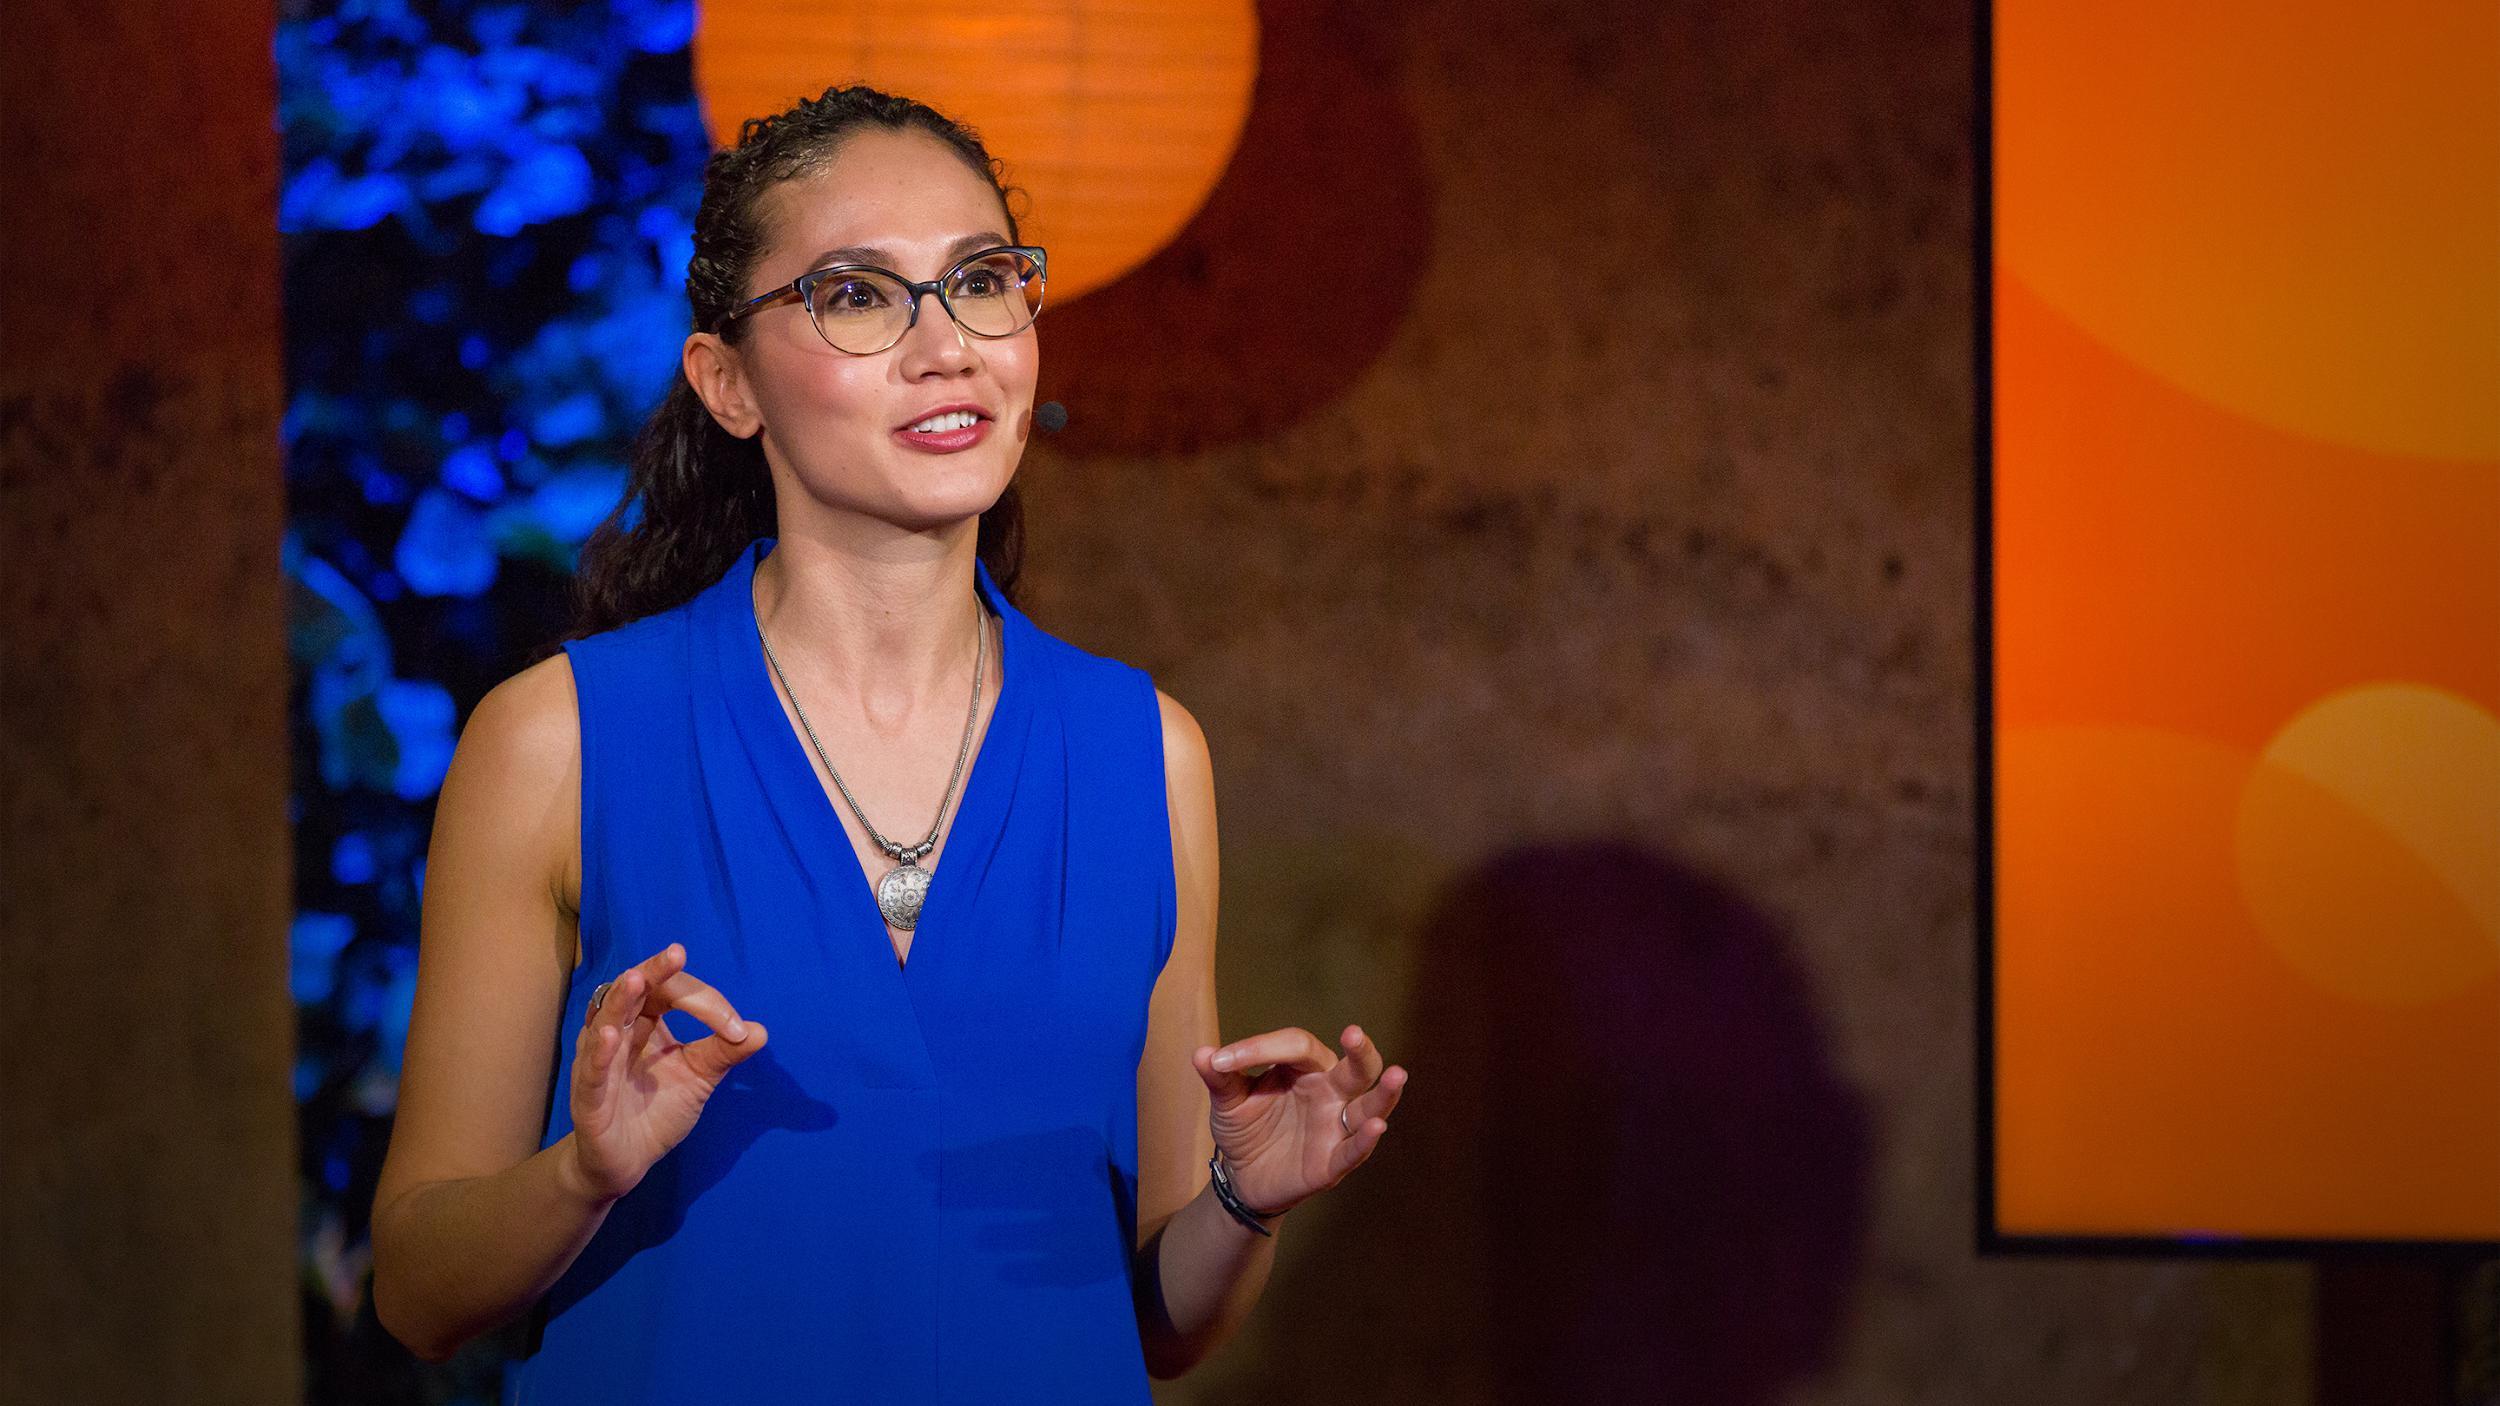 TED TALK 失敗研究所執行董事:別只是勇於止損,要在失敗中學習成長